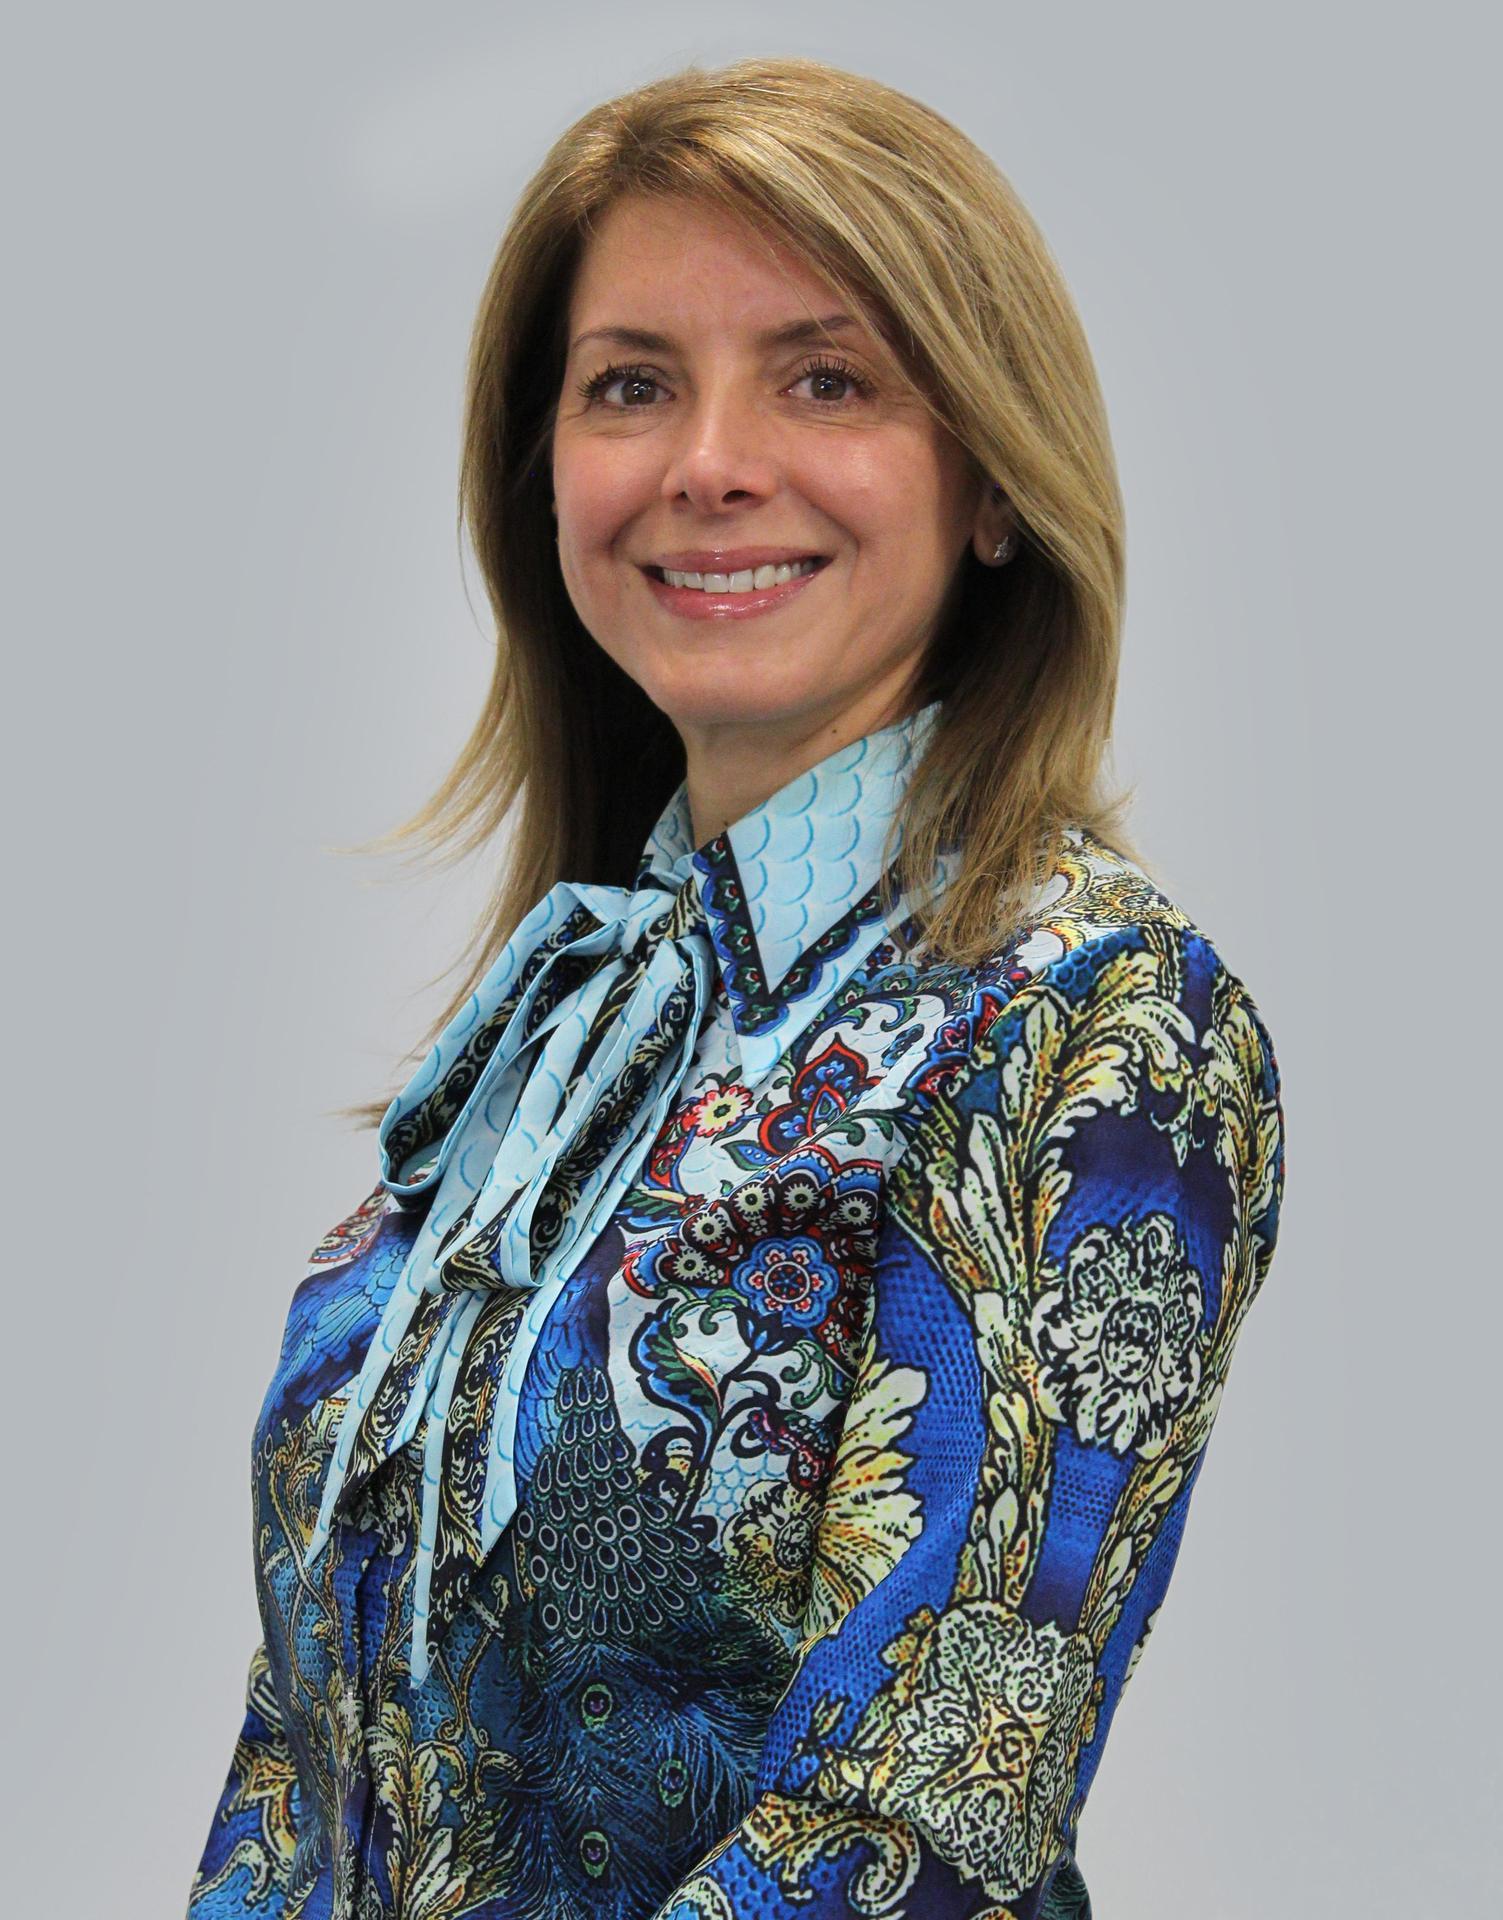 Headshot of Laura Marotta